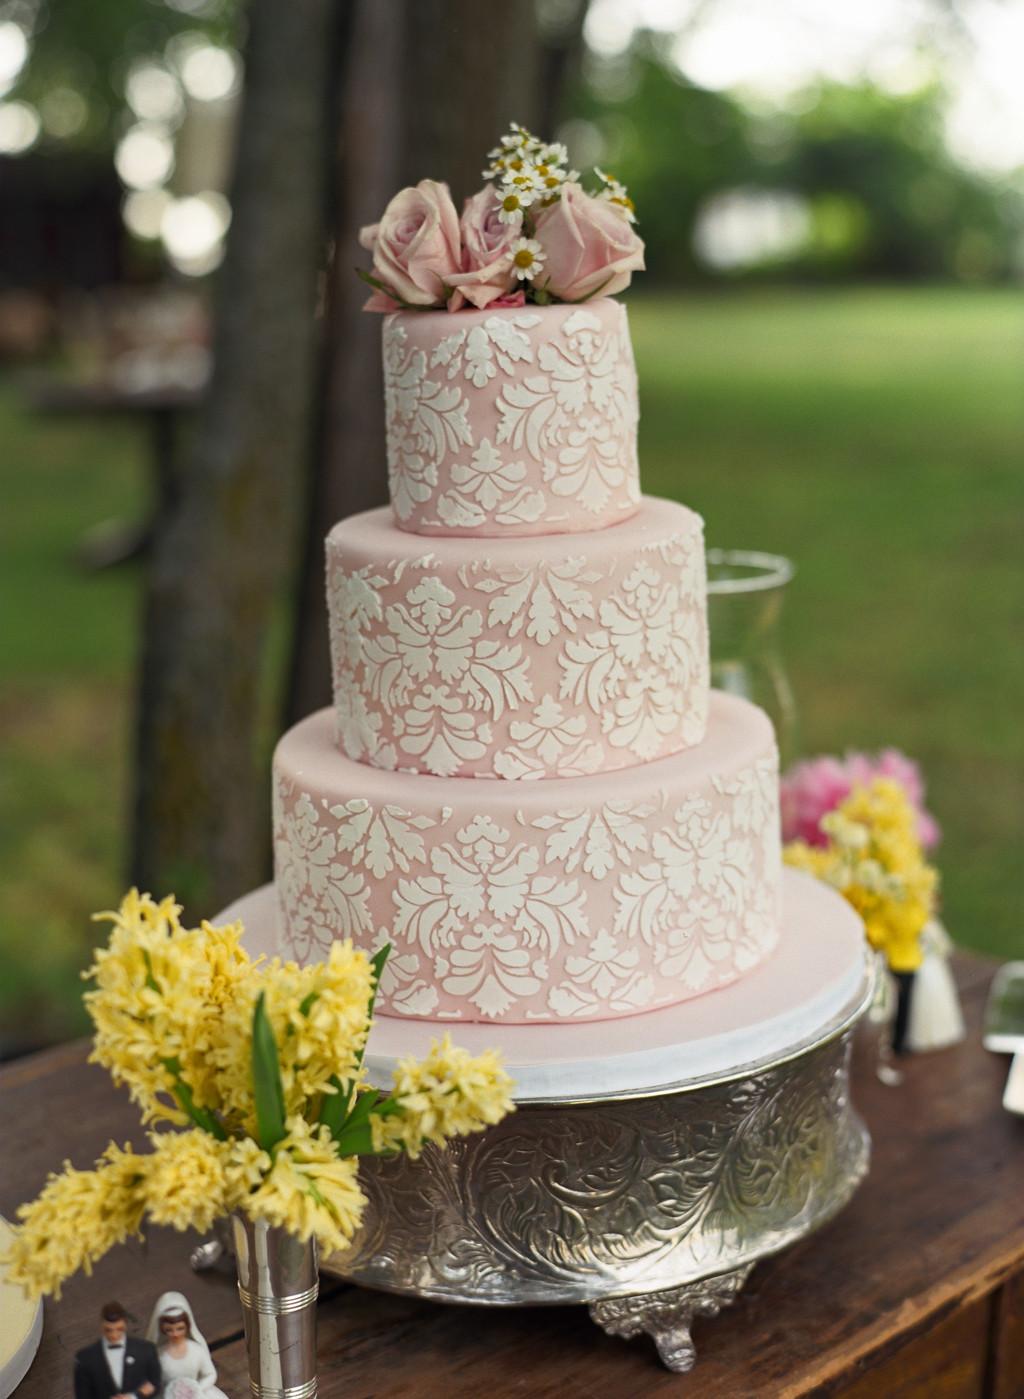 Wedding Cakes Vintage  wedding cake toppers Fireman Cake Toppers For Wedding Cakes